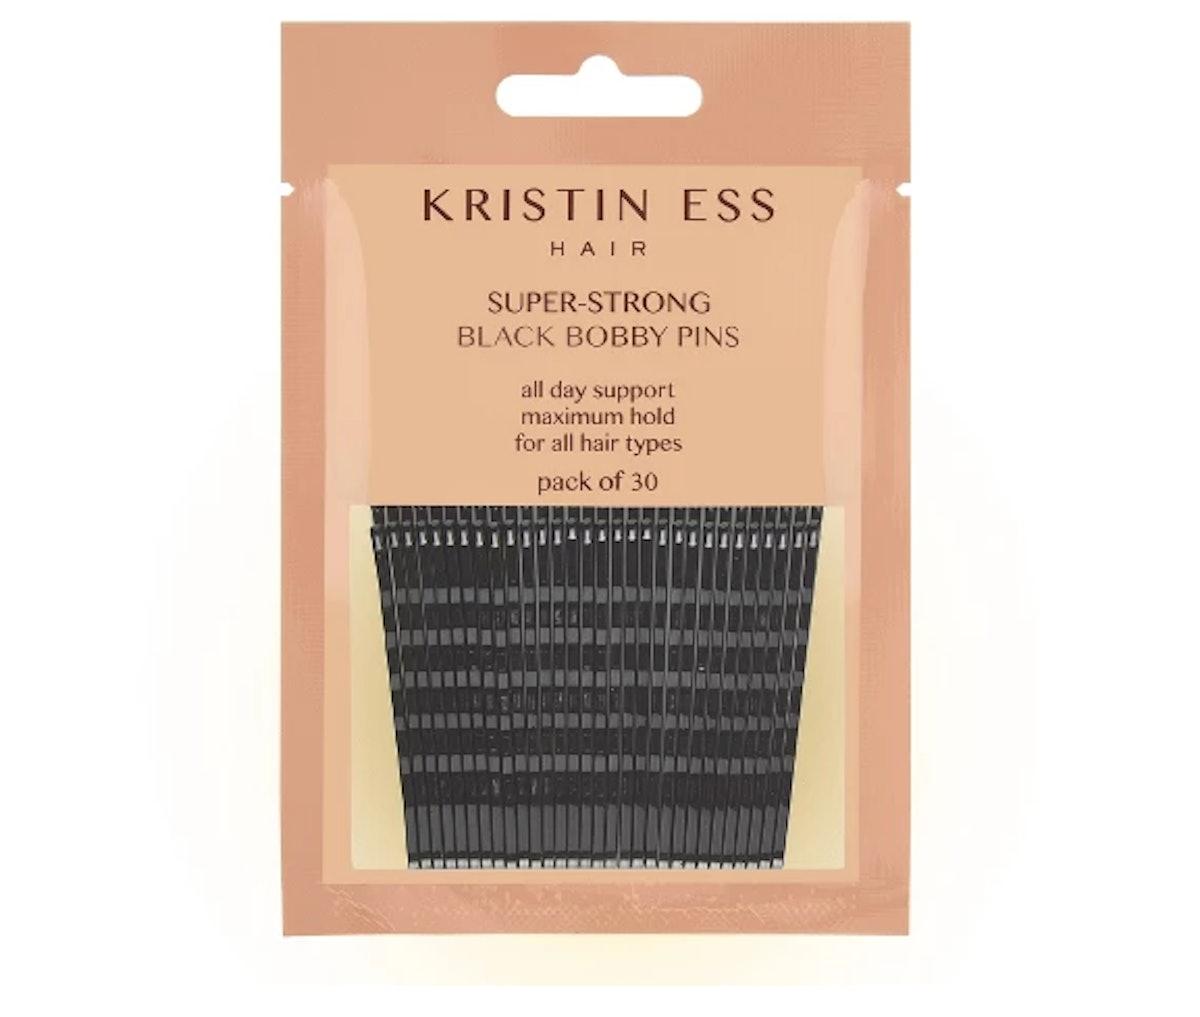 Kristin Ess Super-Strong Black Bobby Pins - 30ct